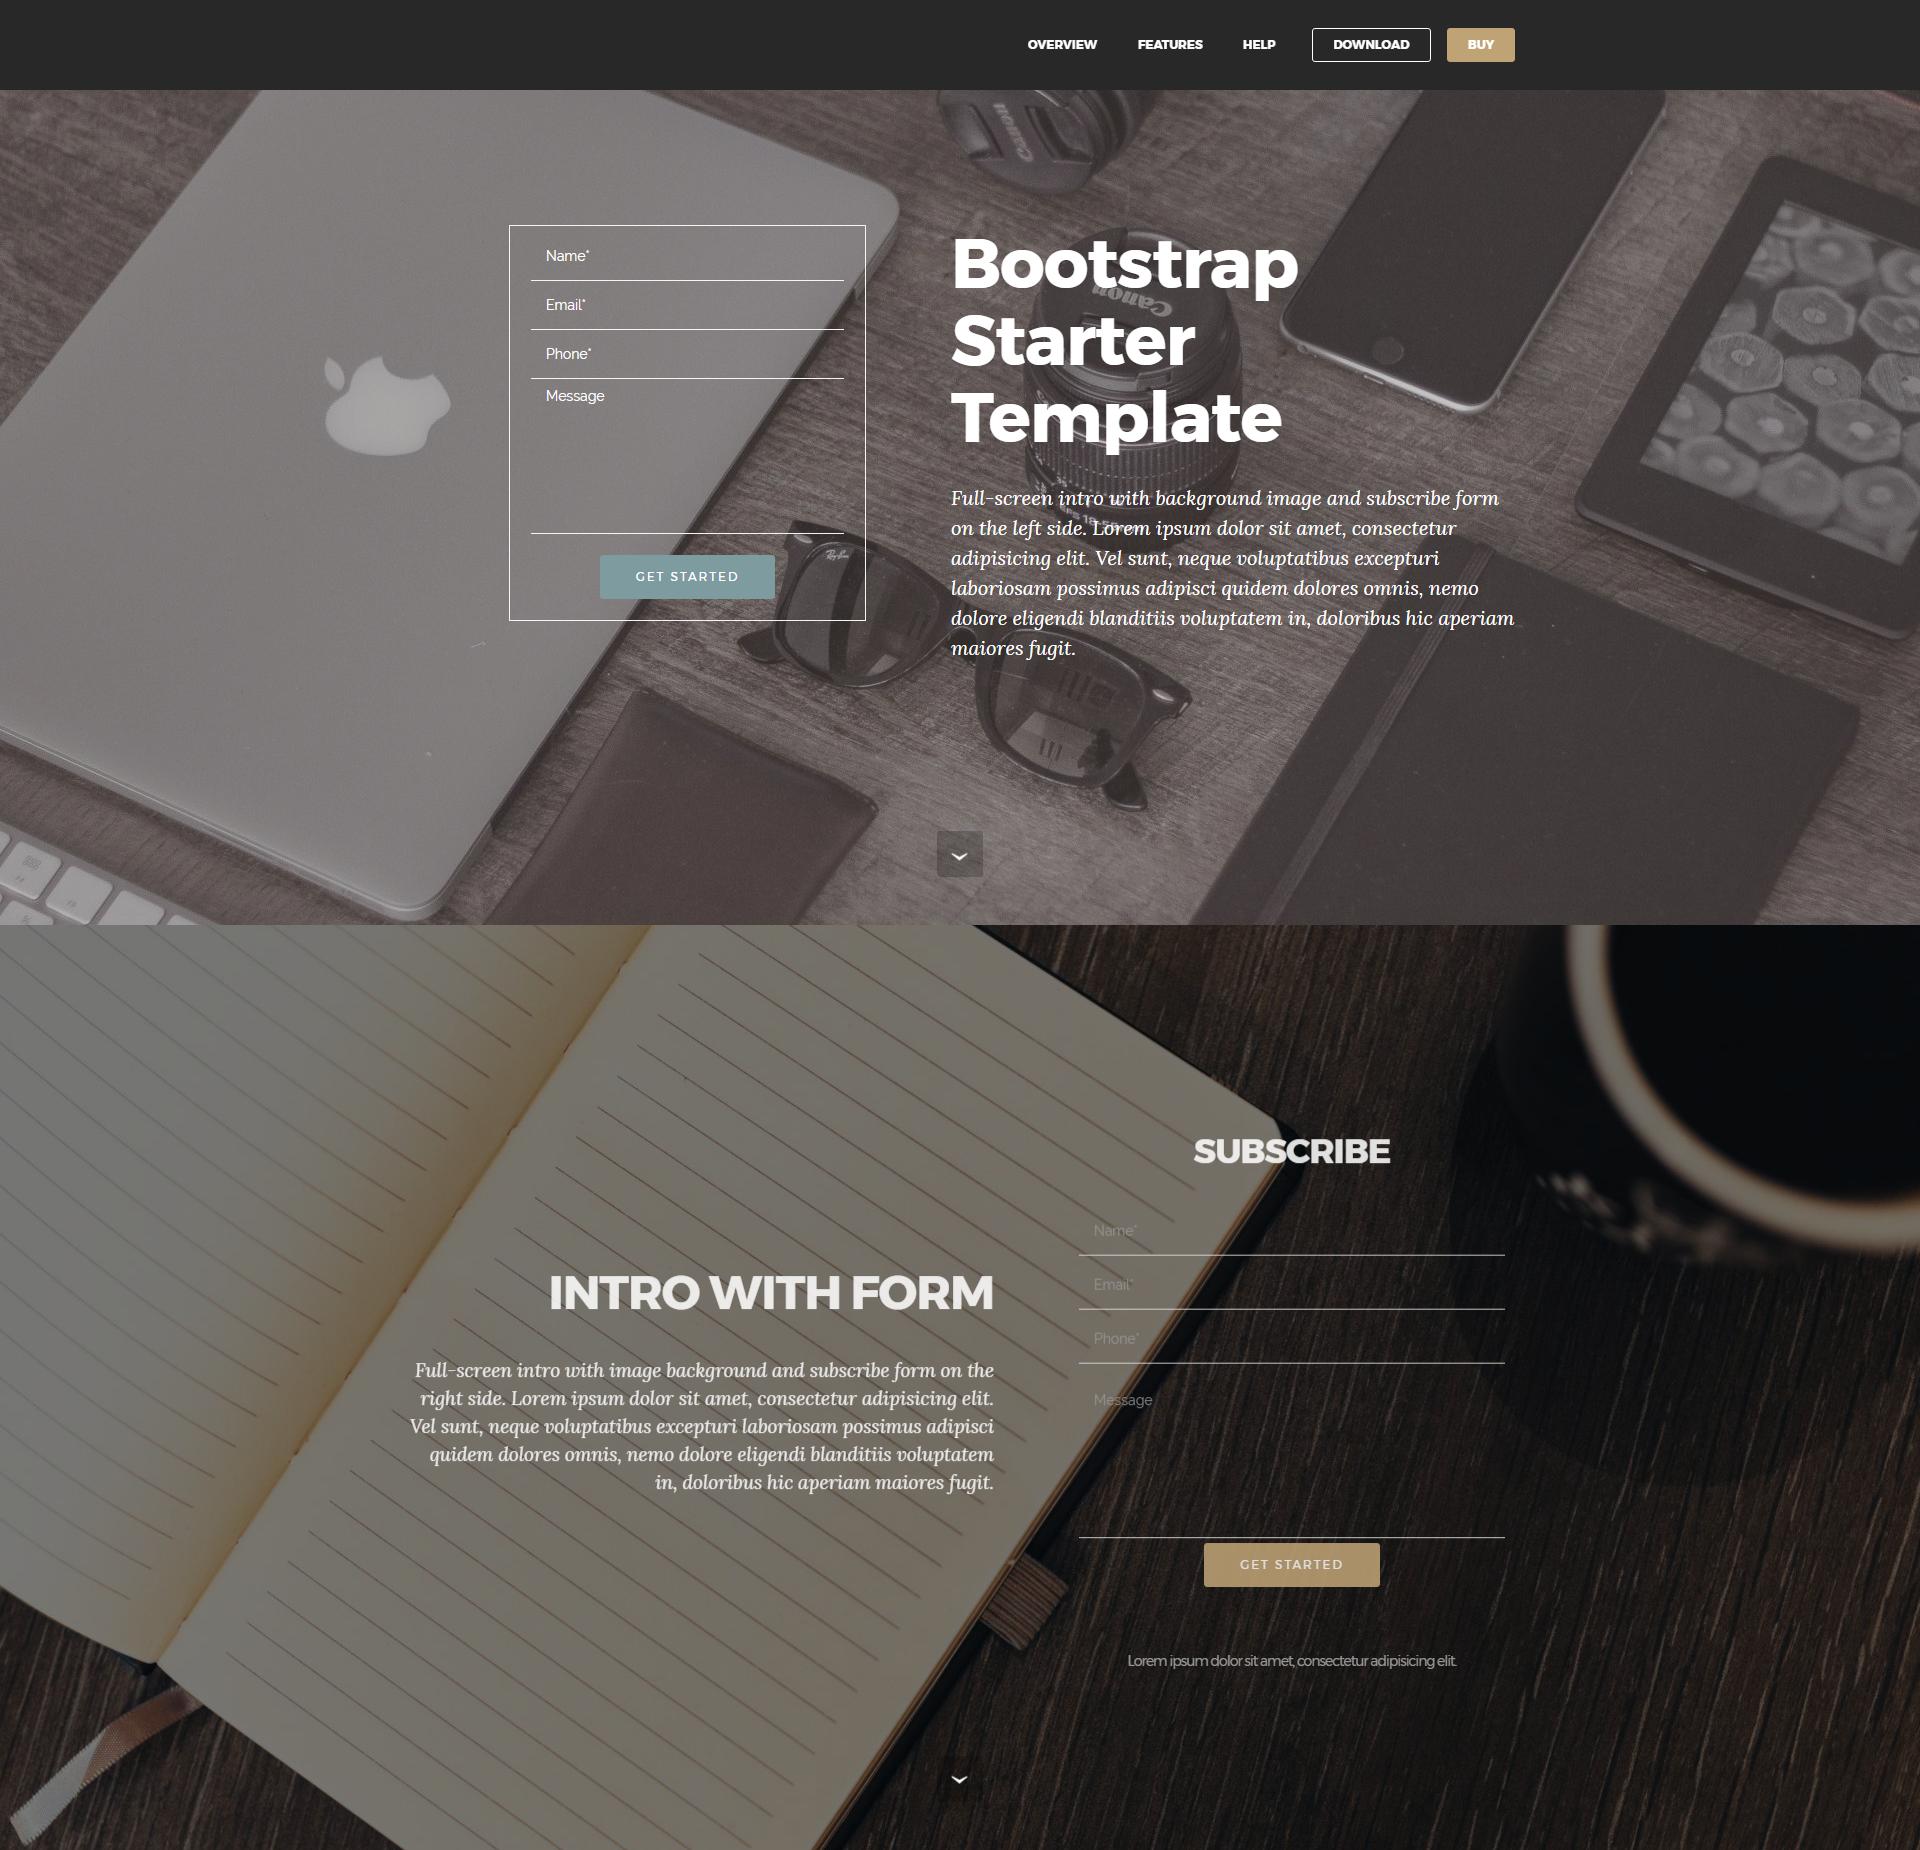 Responsive Bootstrap Starter Templates